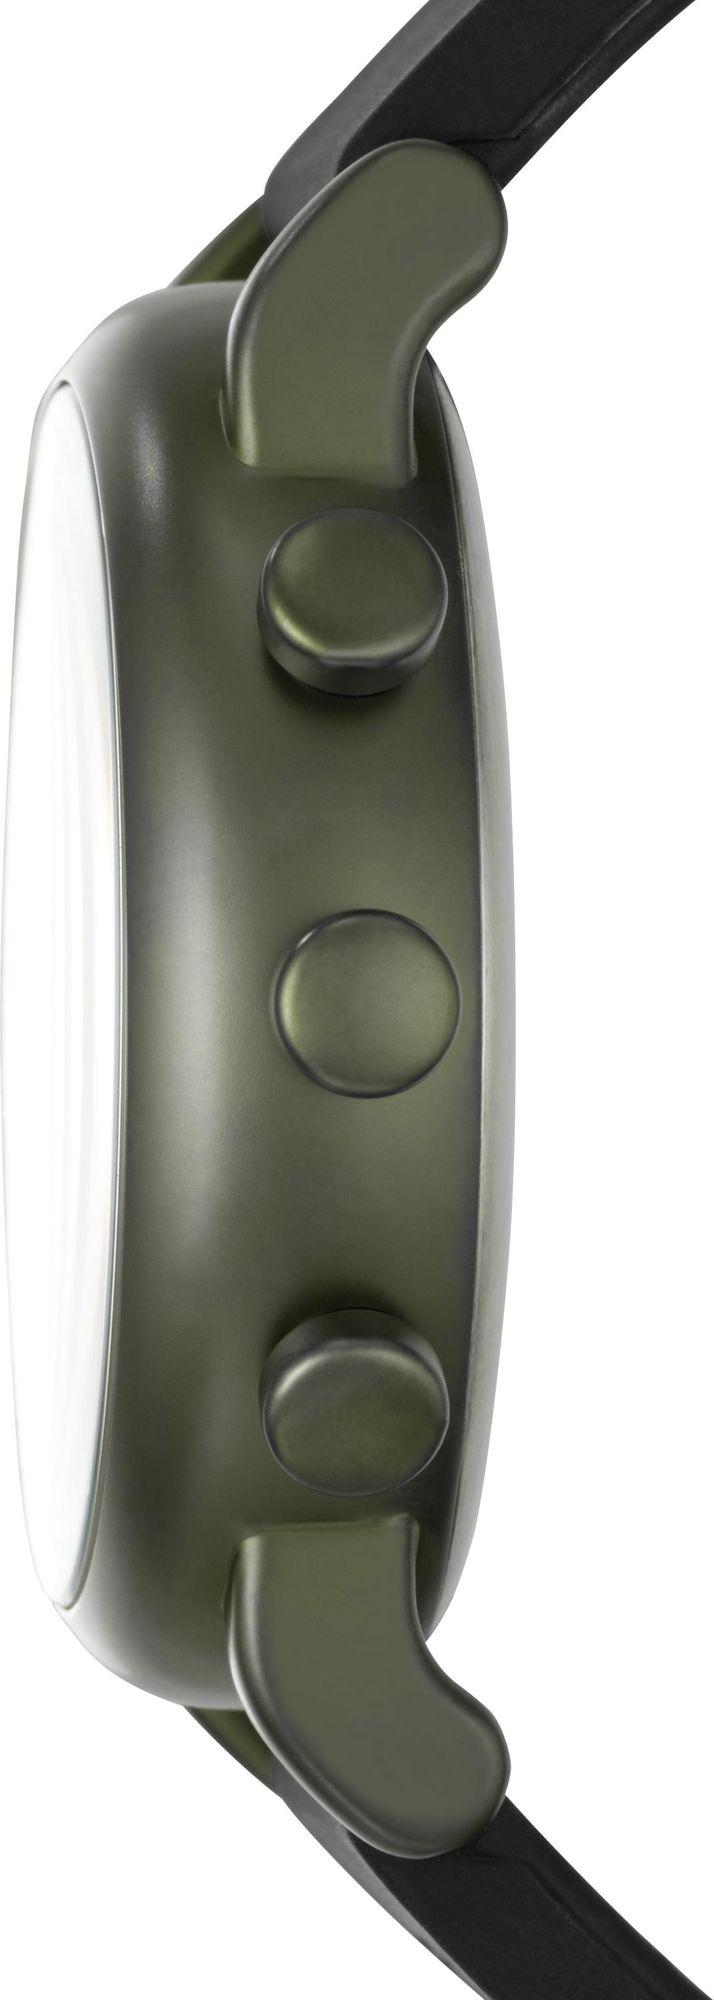 Armani Connected SMARTWATCH ART3016 Smartwatch